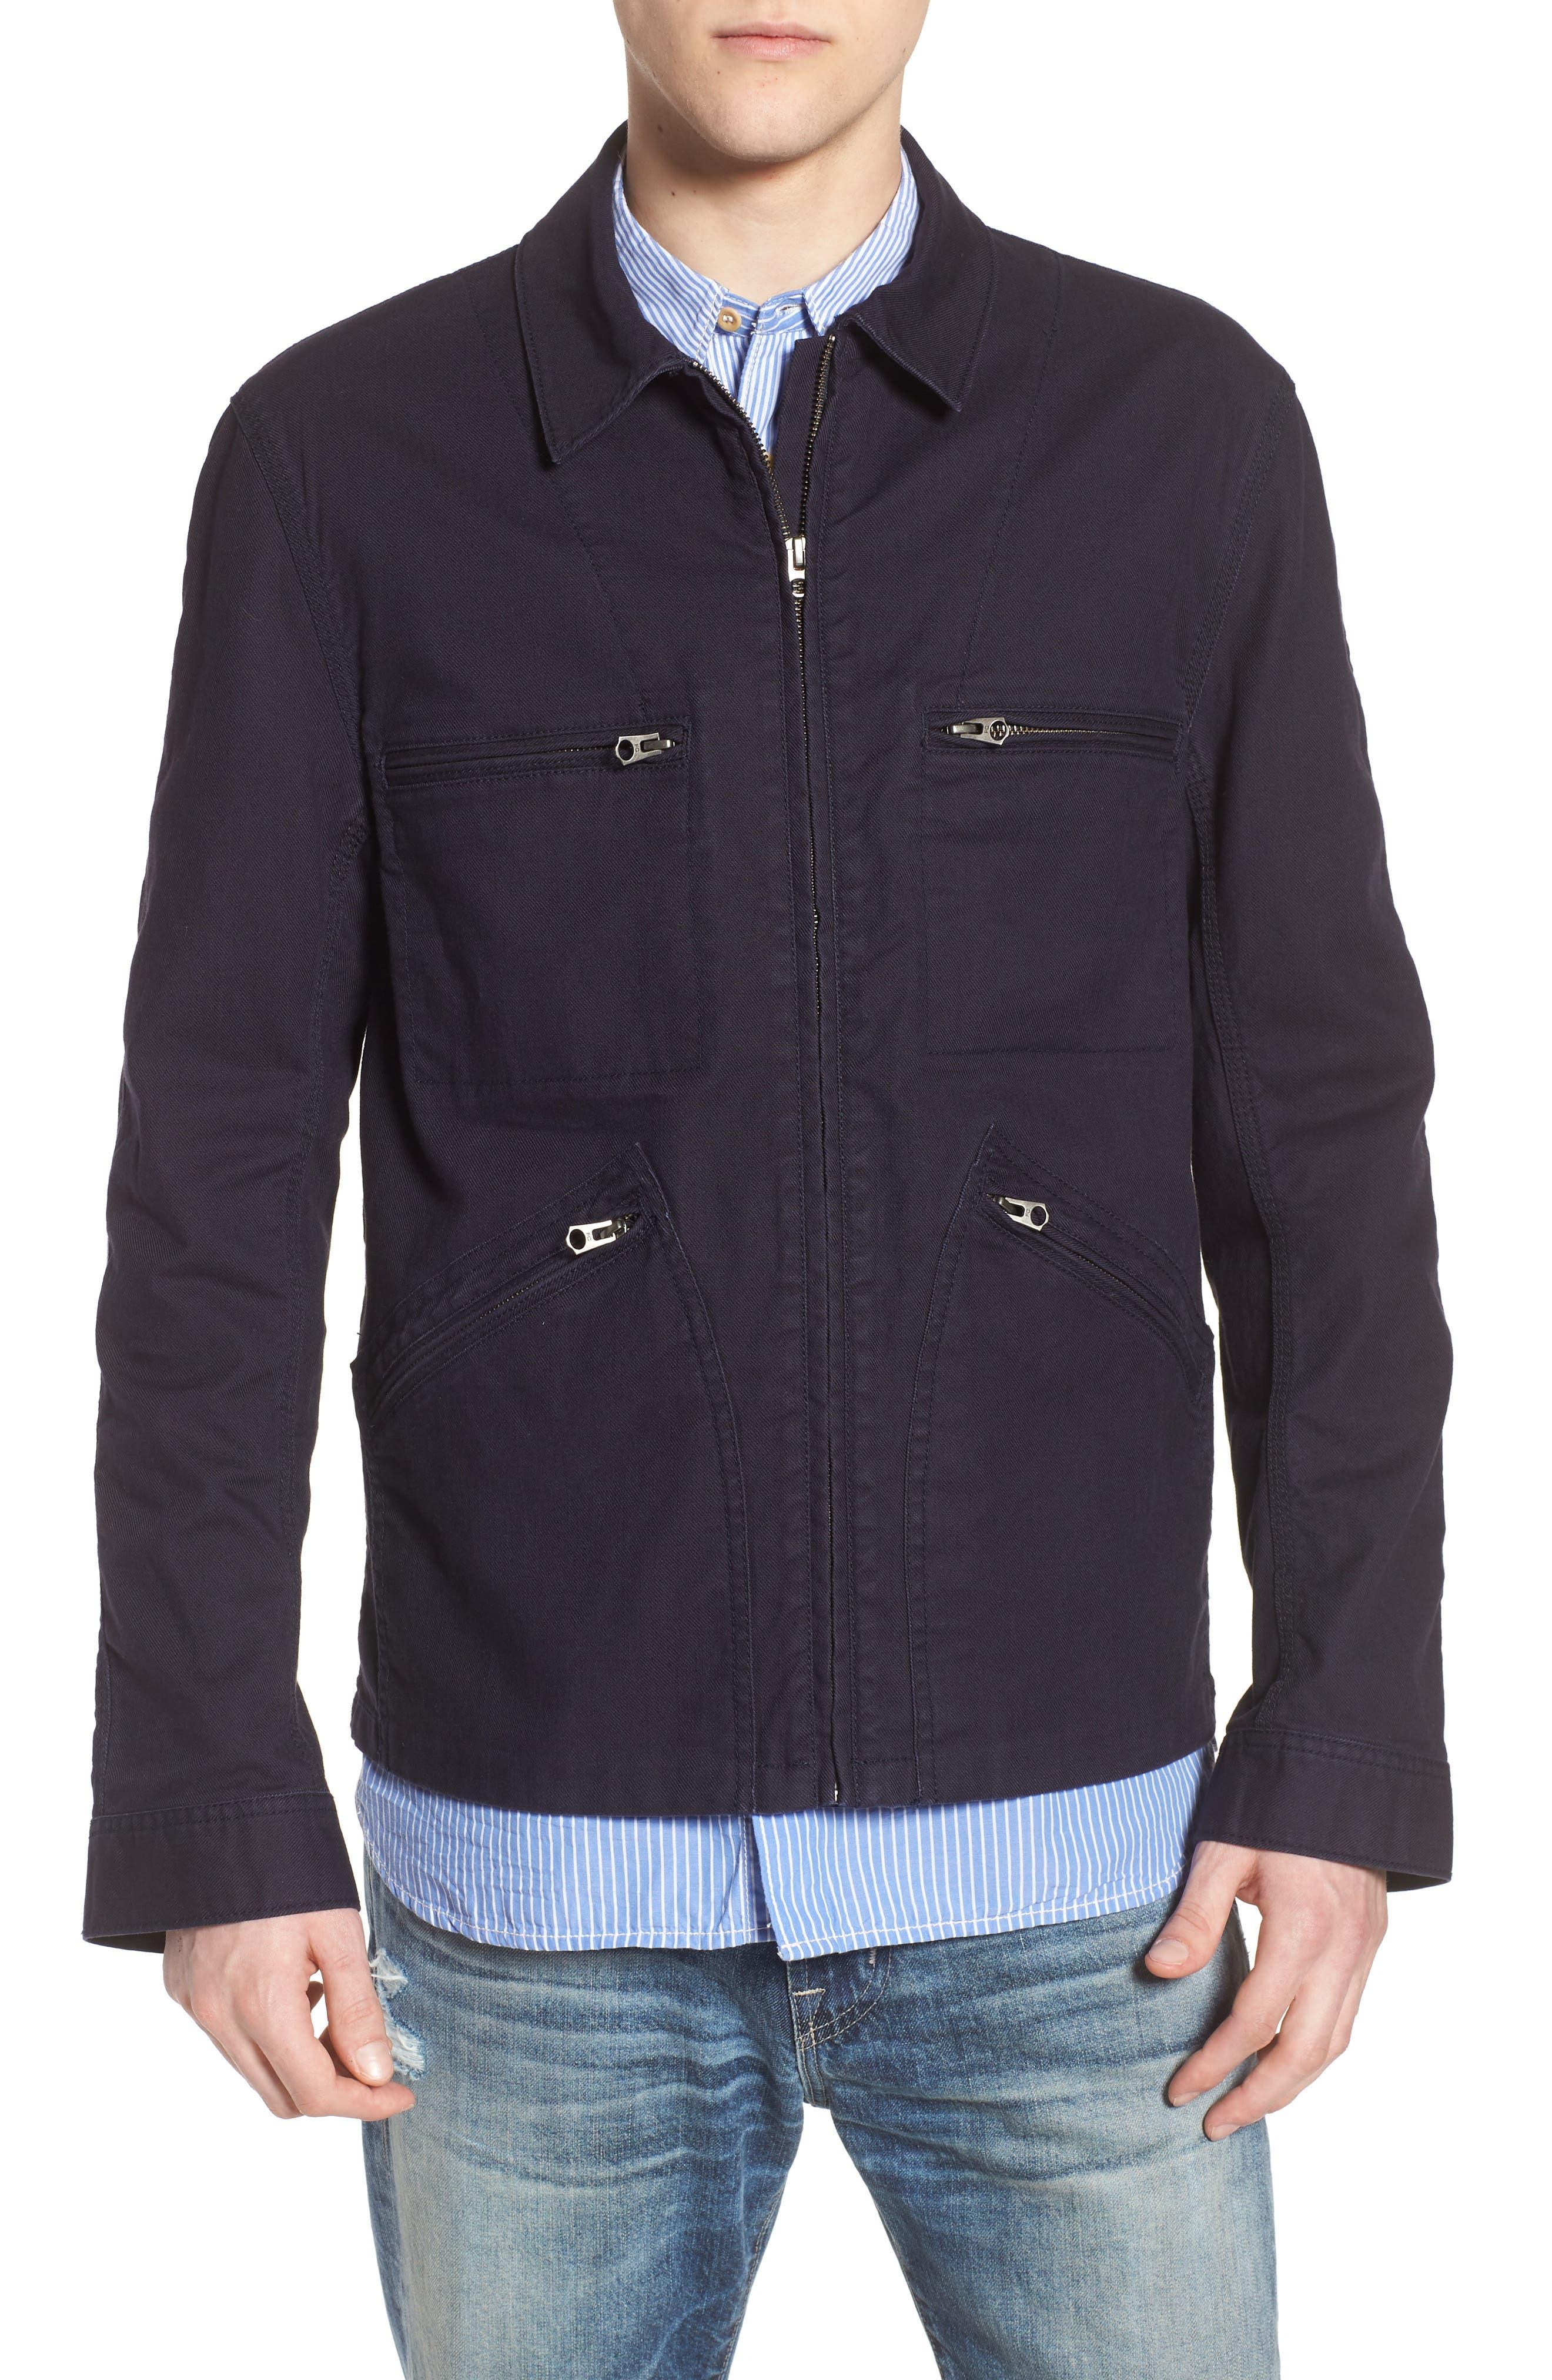 Slim Fit Slub Twill Cotton & Linen Jacket,                             Alternate thumbnail 4, color,                             001